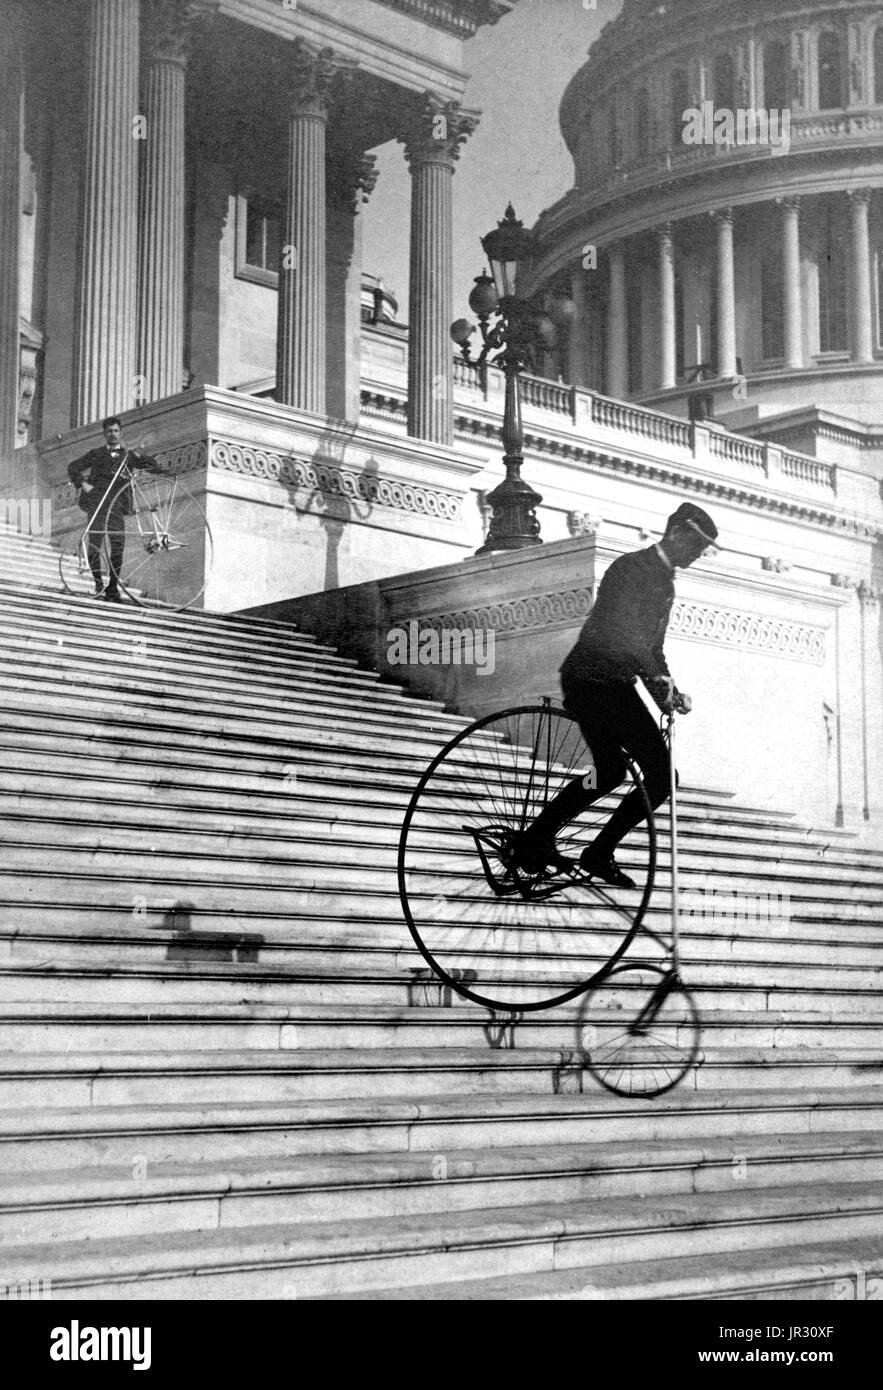 Daredevil Bicycle Rider,1884 - Stock Image